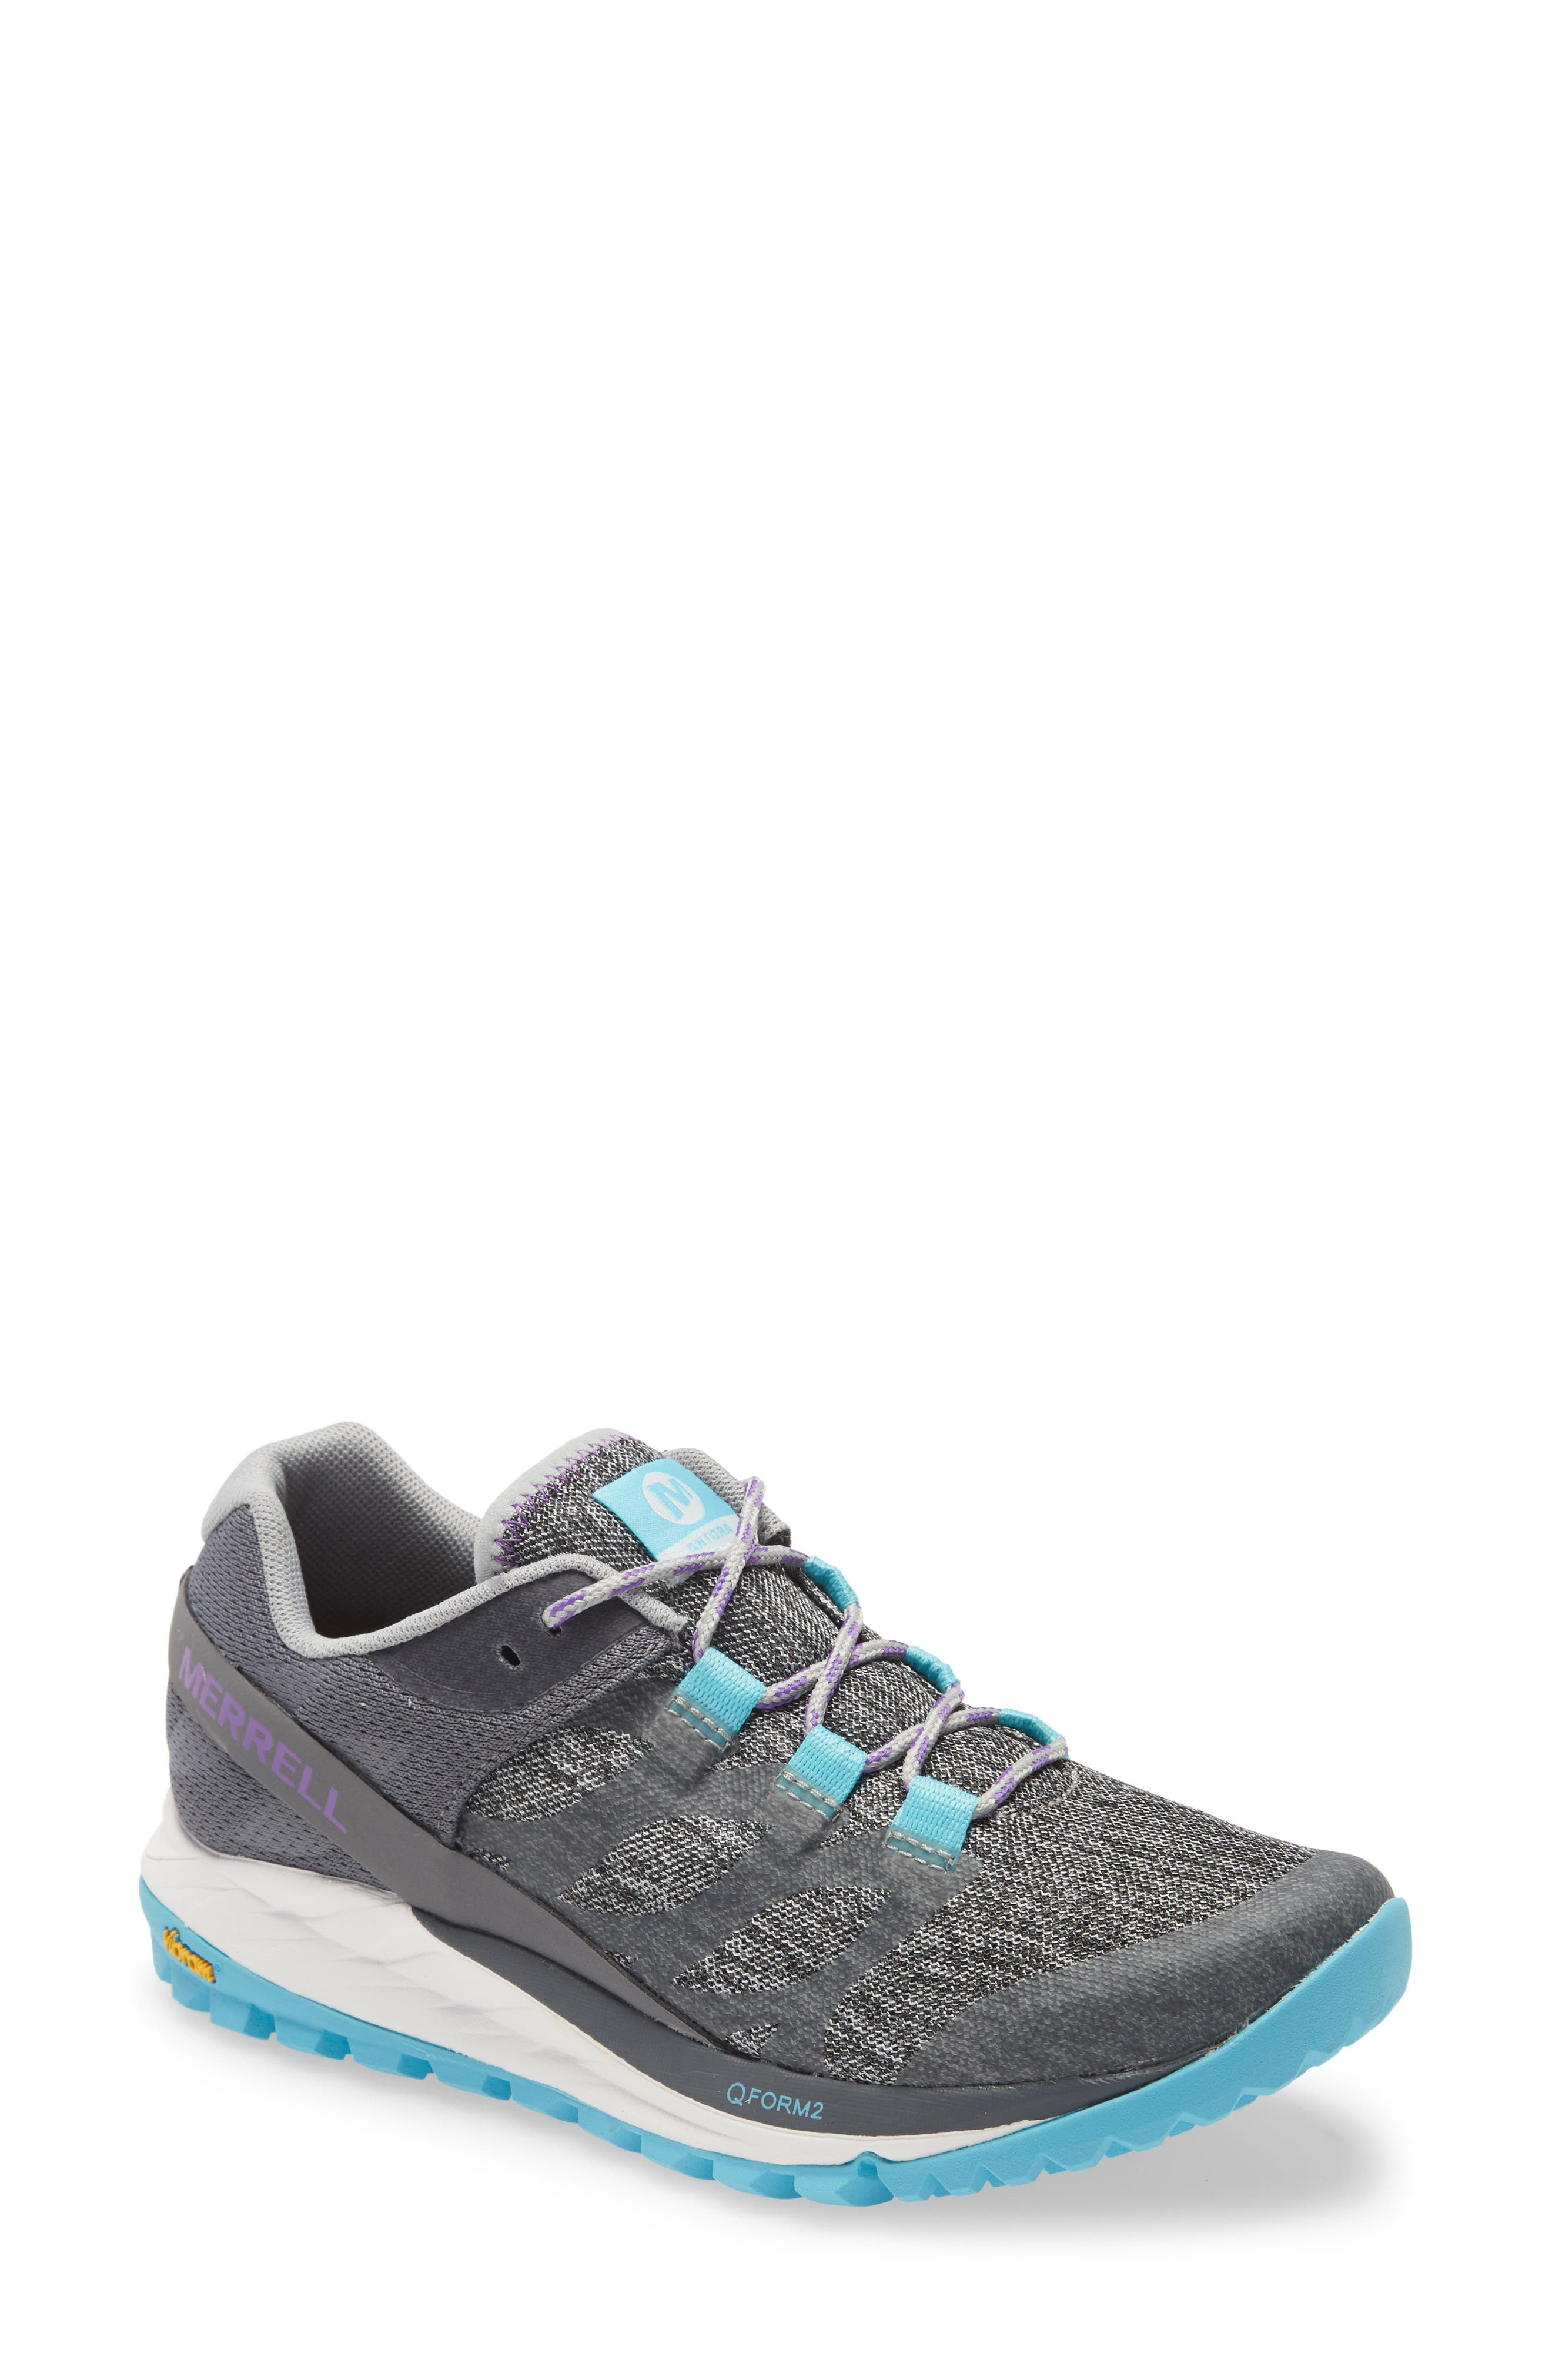 Antora Trail Running Shoe